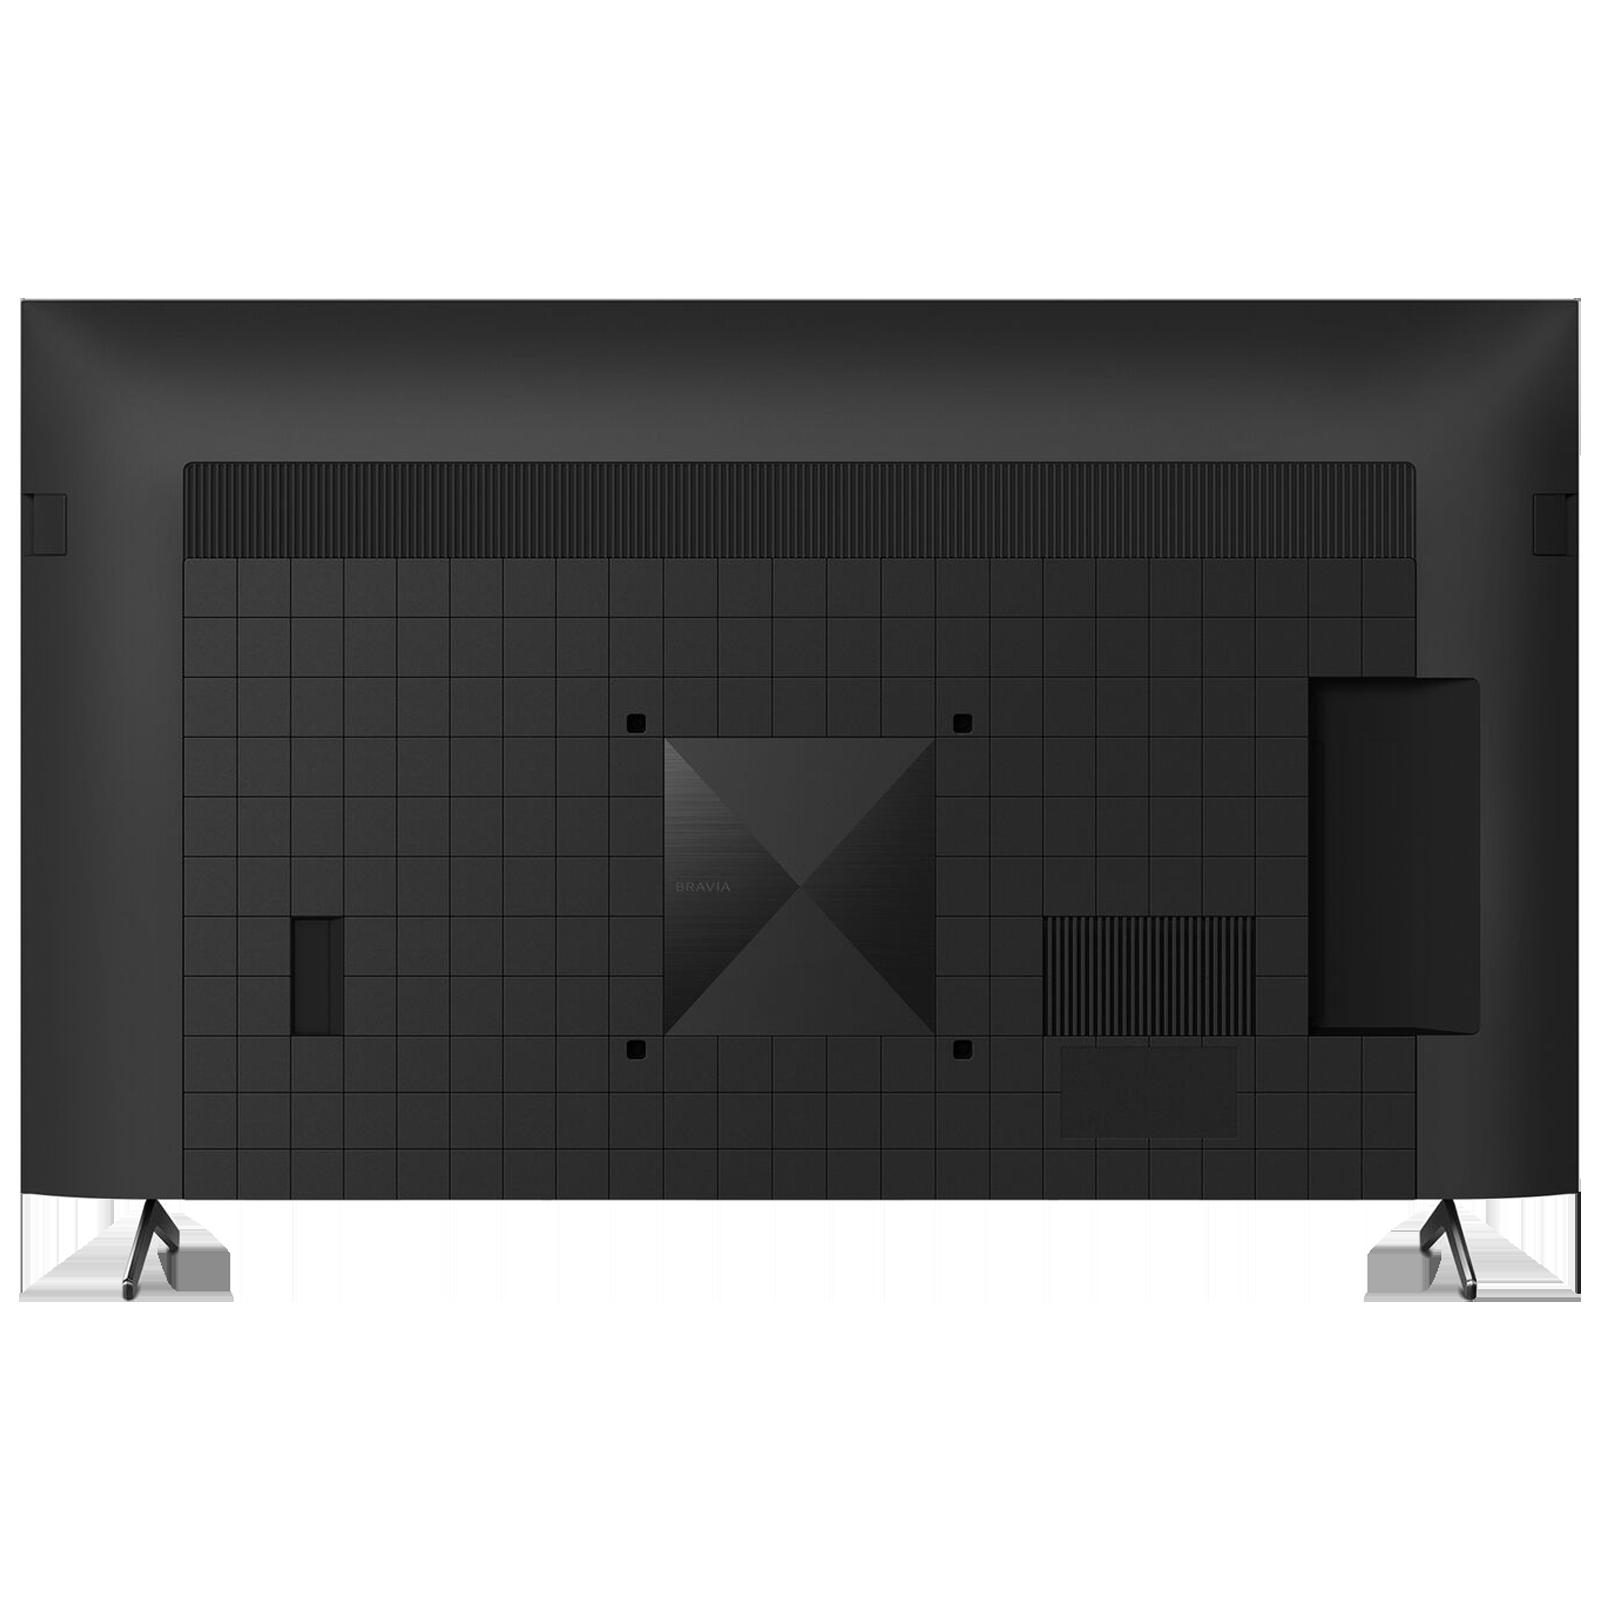 Sony Bravia X90J Series139cm (55 Inch) Ultra HD 4K Full Array LED Google Smart TV (XR Cognitive Processor, XR-55X90J, Black) 6